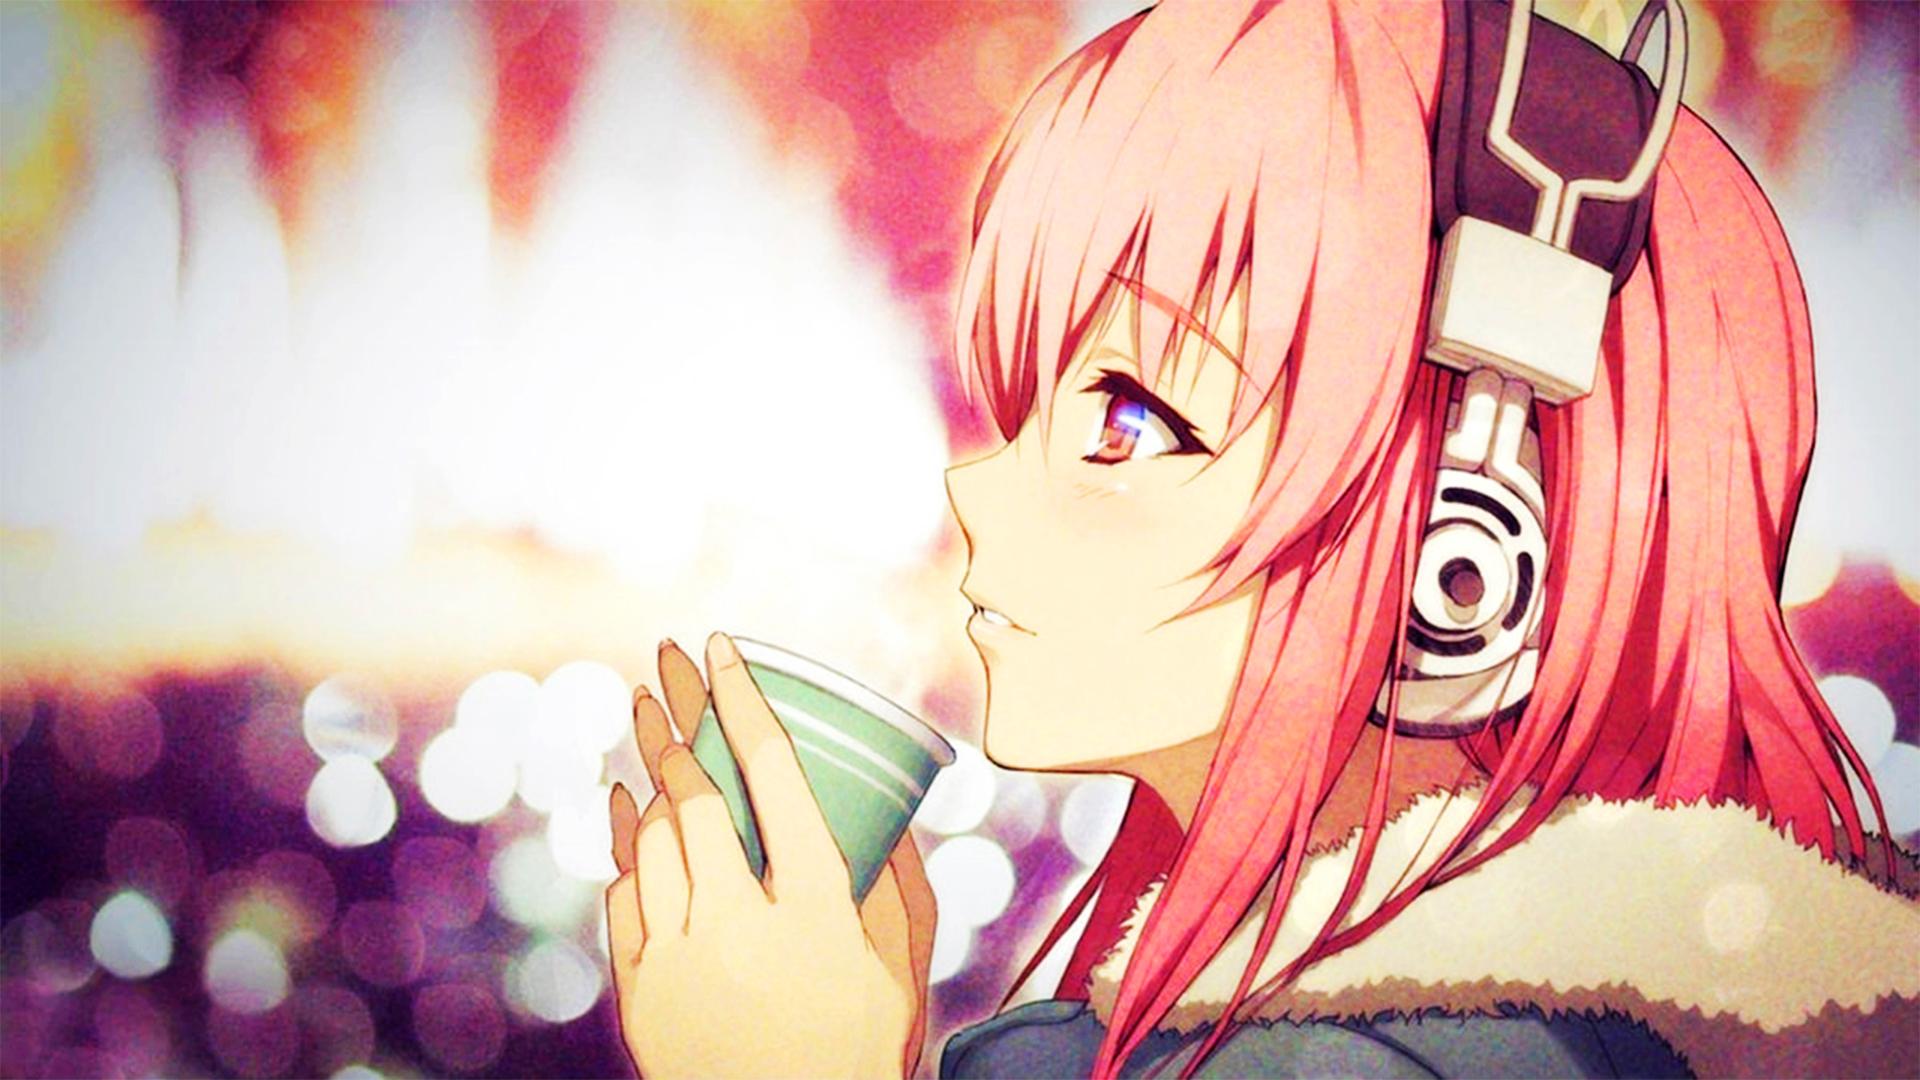 Anime Girl With Headphones Wallpaper Hd Super Sonico Headphones Pink Hair Coats Wallpapers Hd